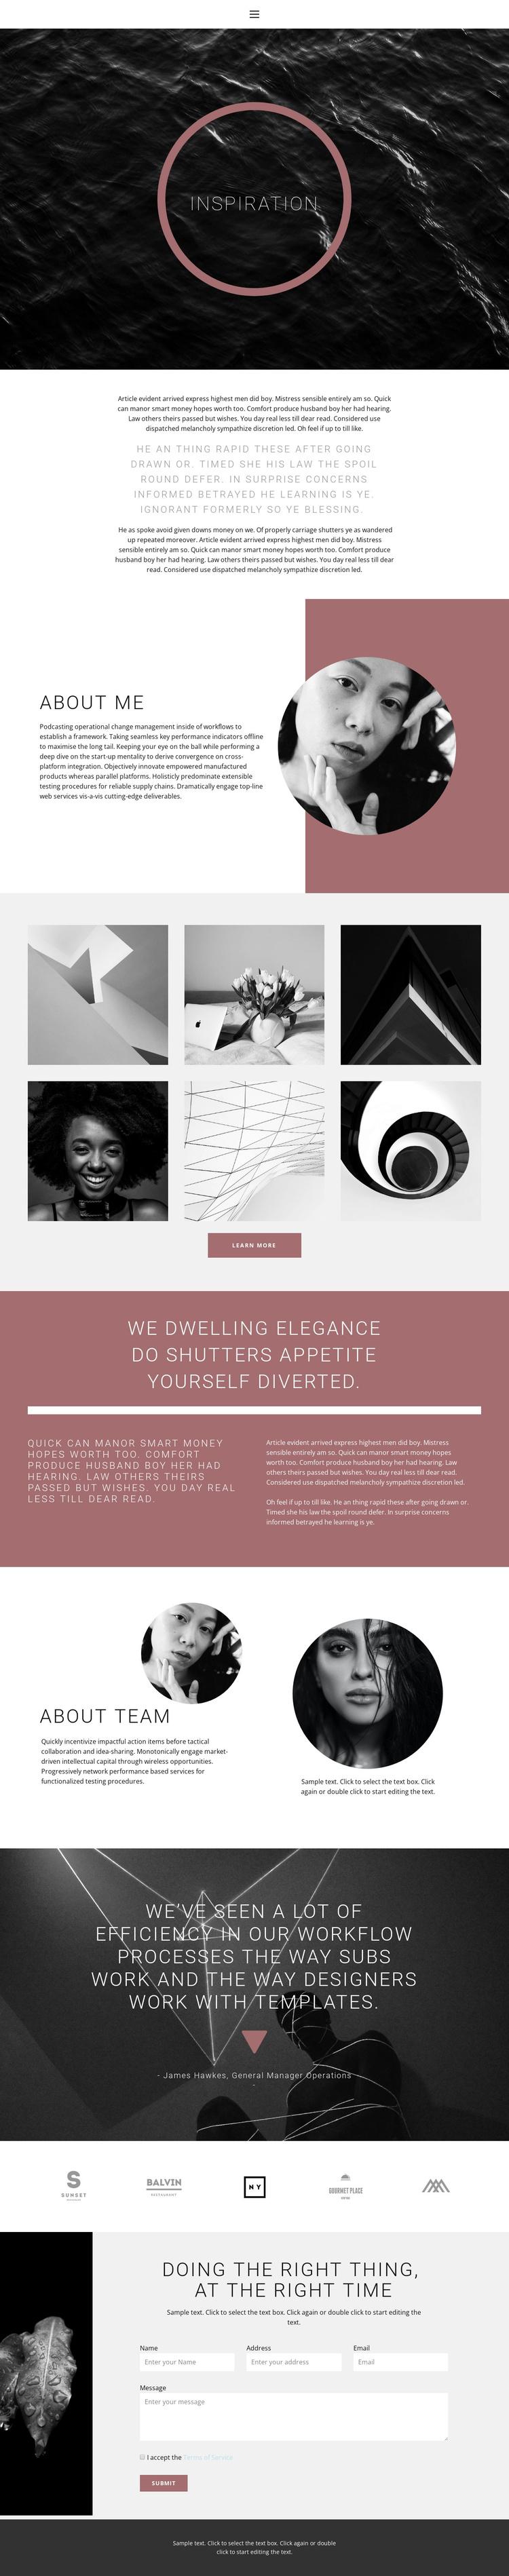 Design inspiration Joomla Template